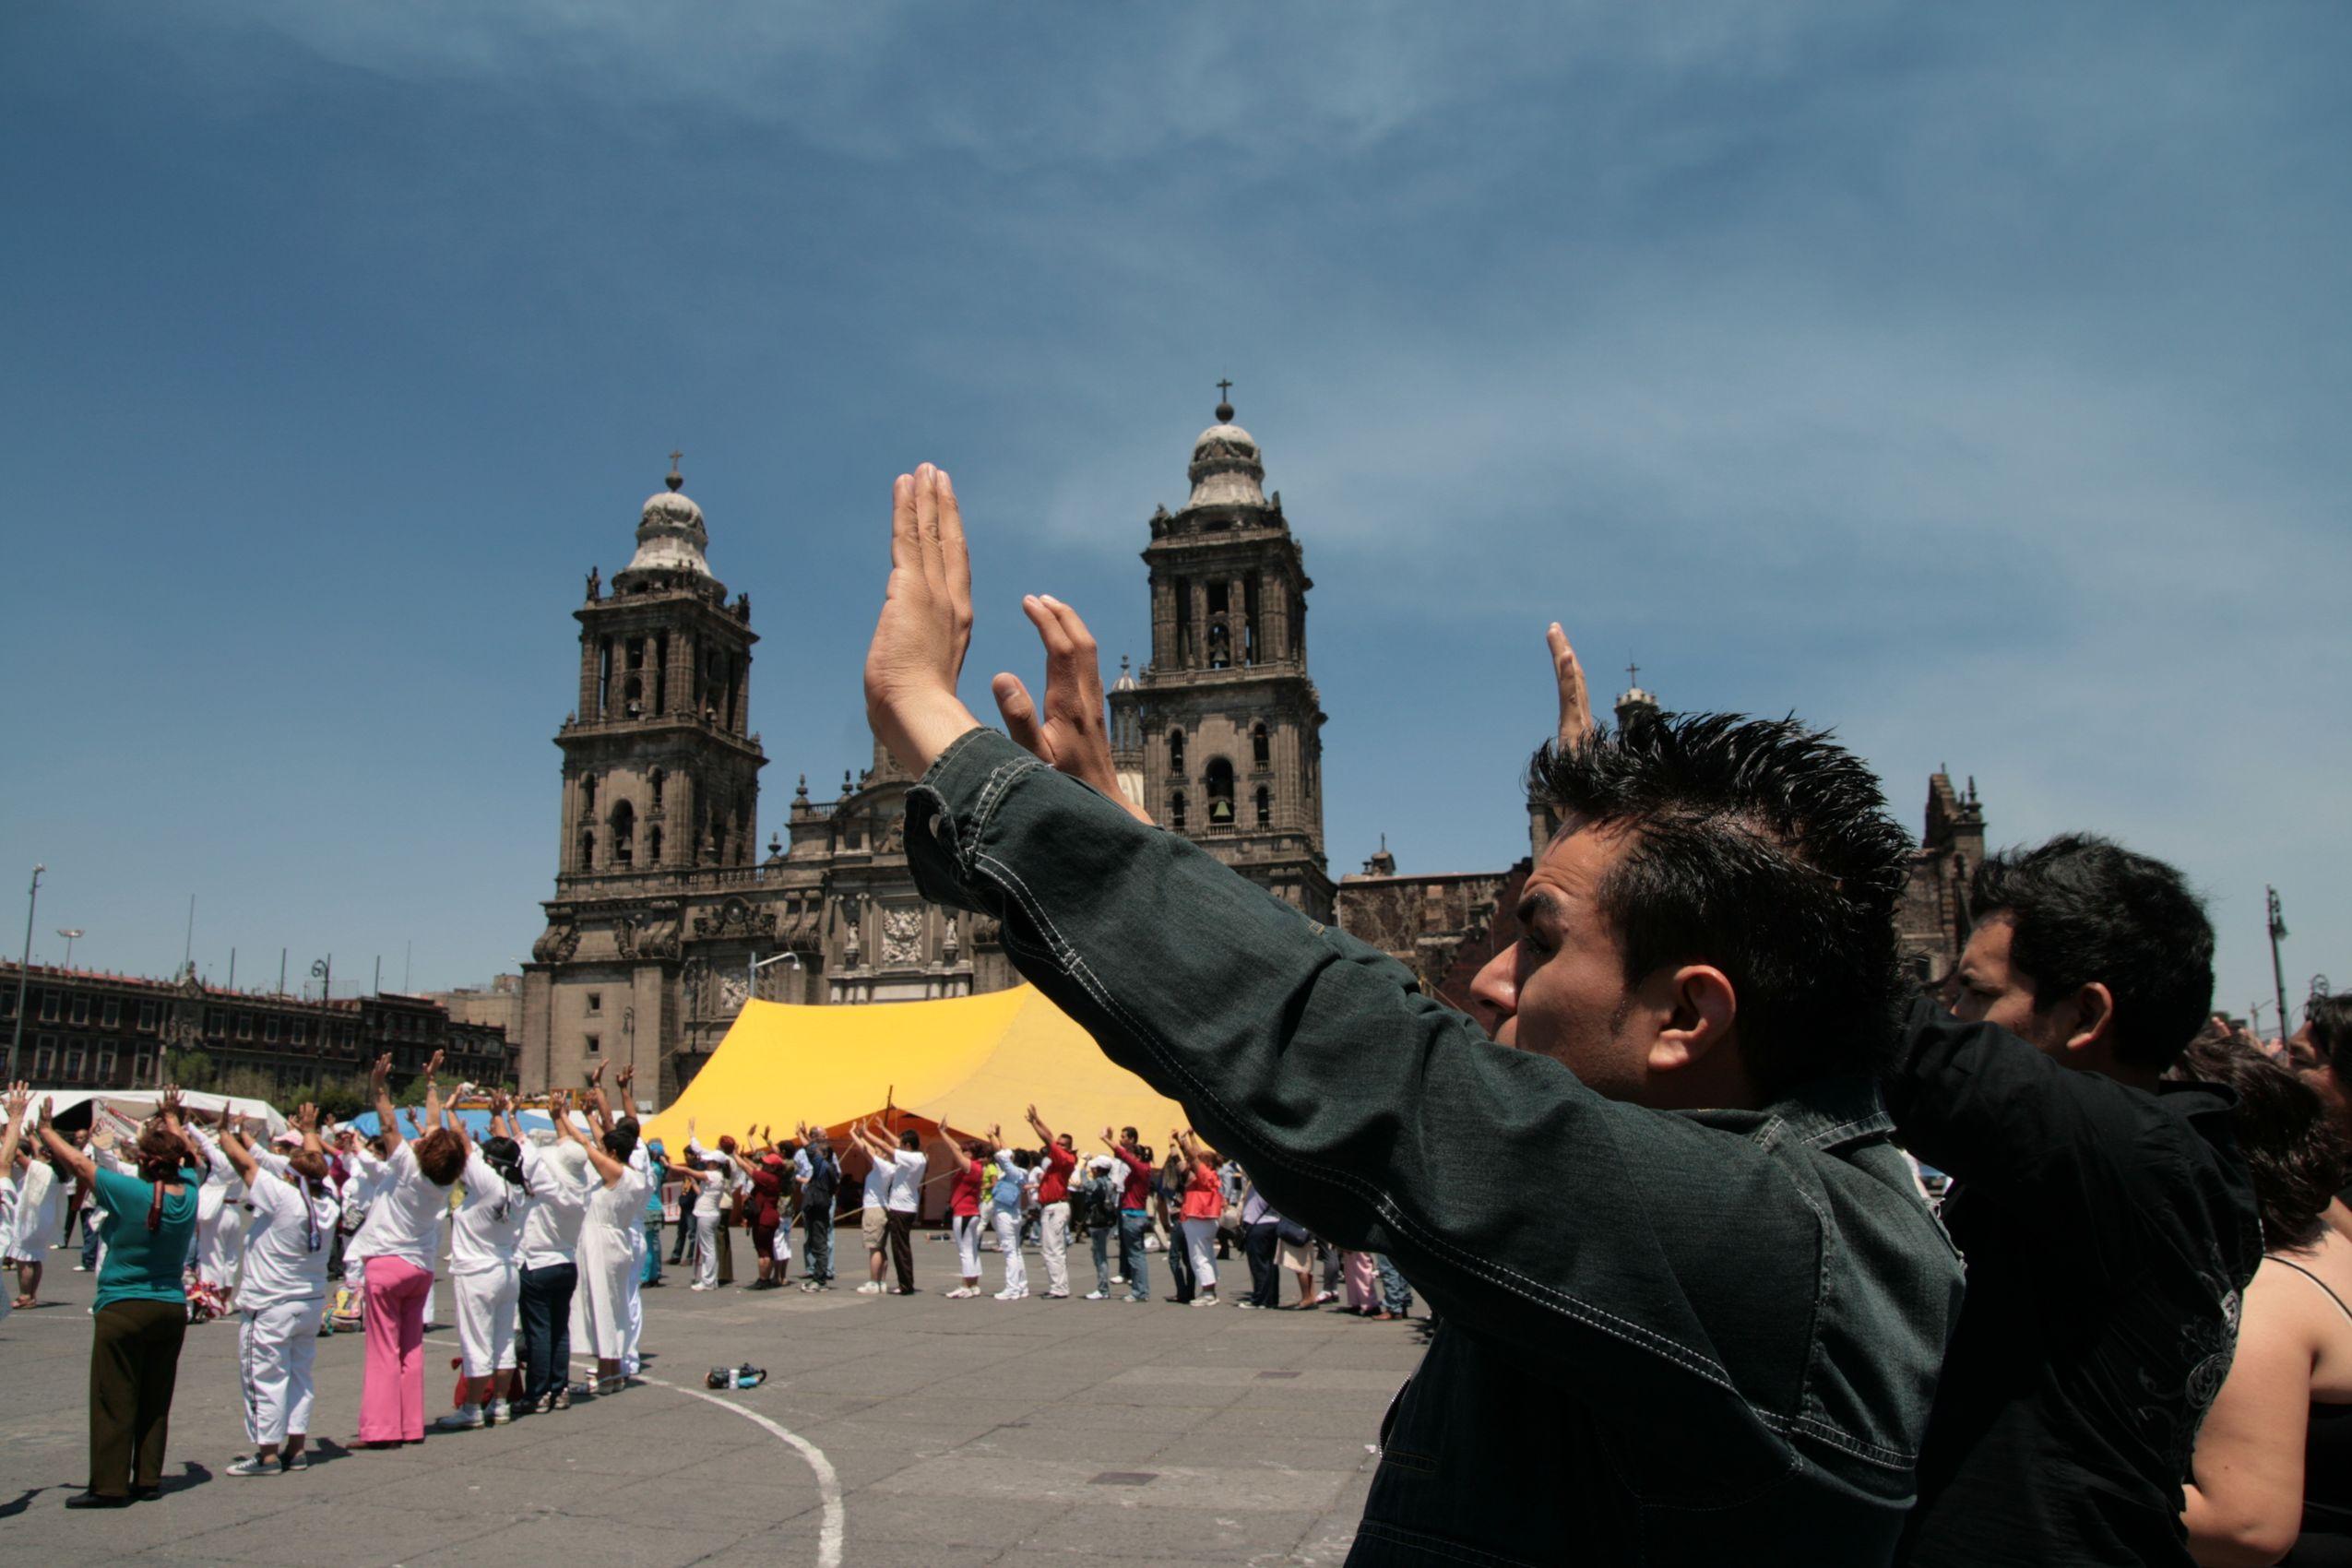 https://bubo.sk/uploads/galleries/3464/katkaliskovast_mexiko_2011_vysledok.jpg